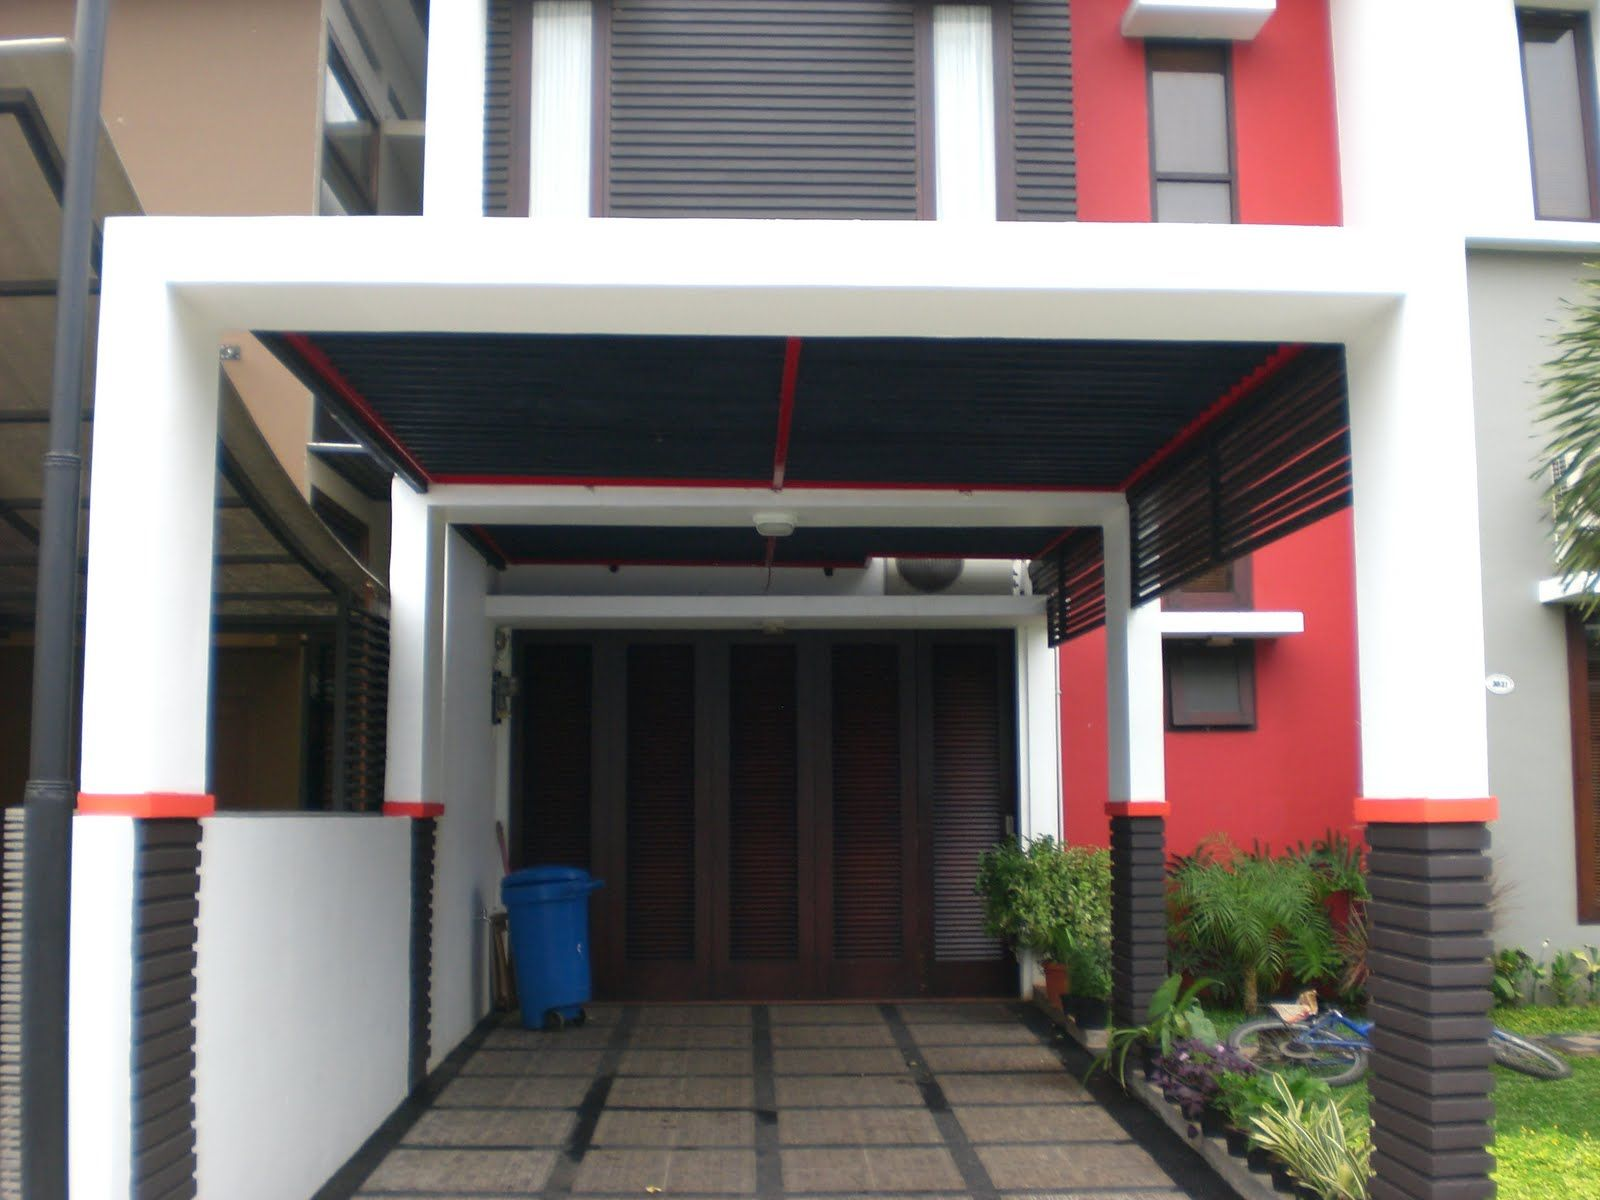 38 Images of a Minimalist Home Canopy Model Desain rumah